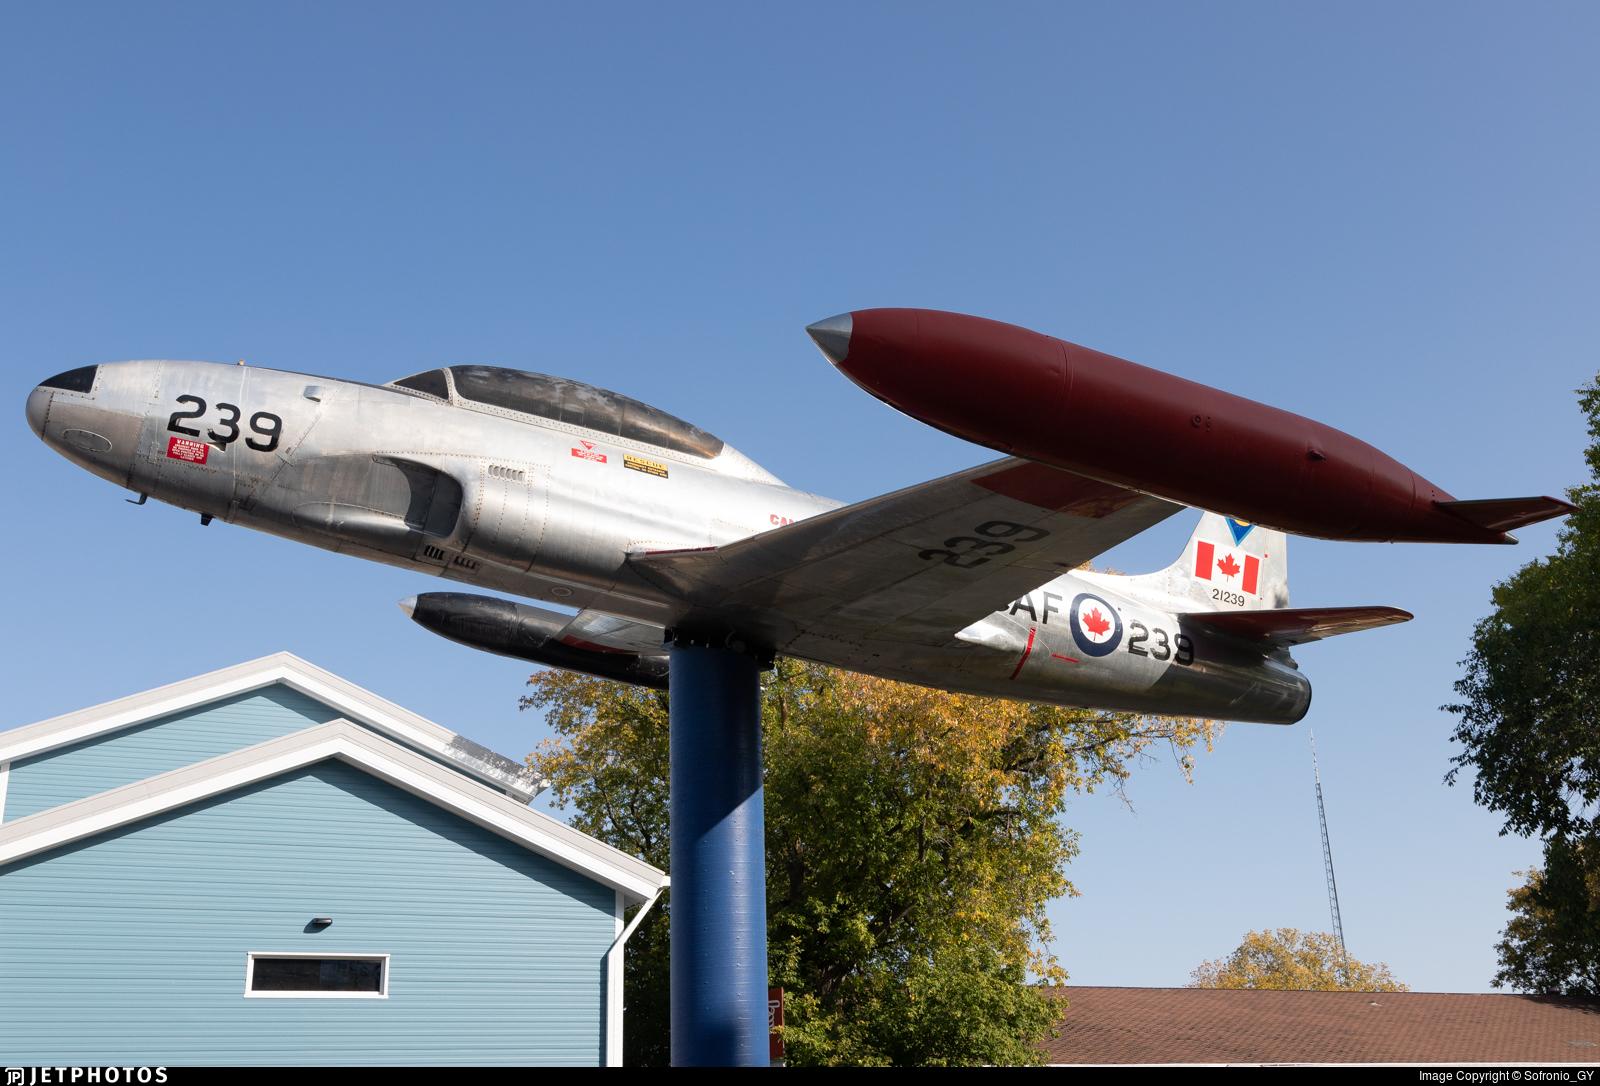 21239 - Canadair CT-133 Silver Star - Canada - Royal Canadian Air Force (RCAF)